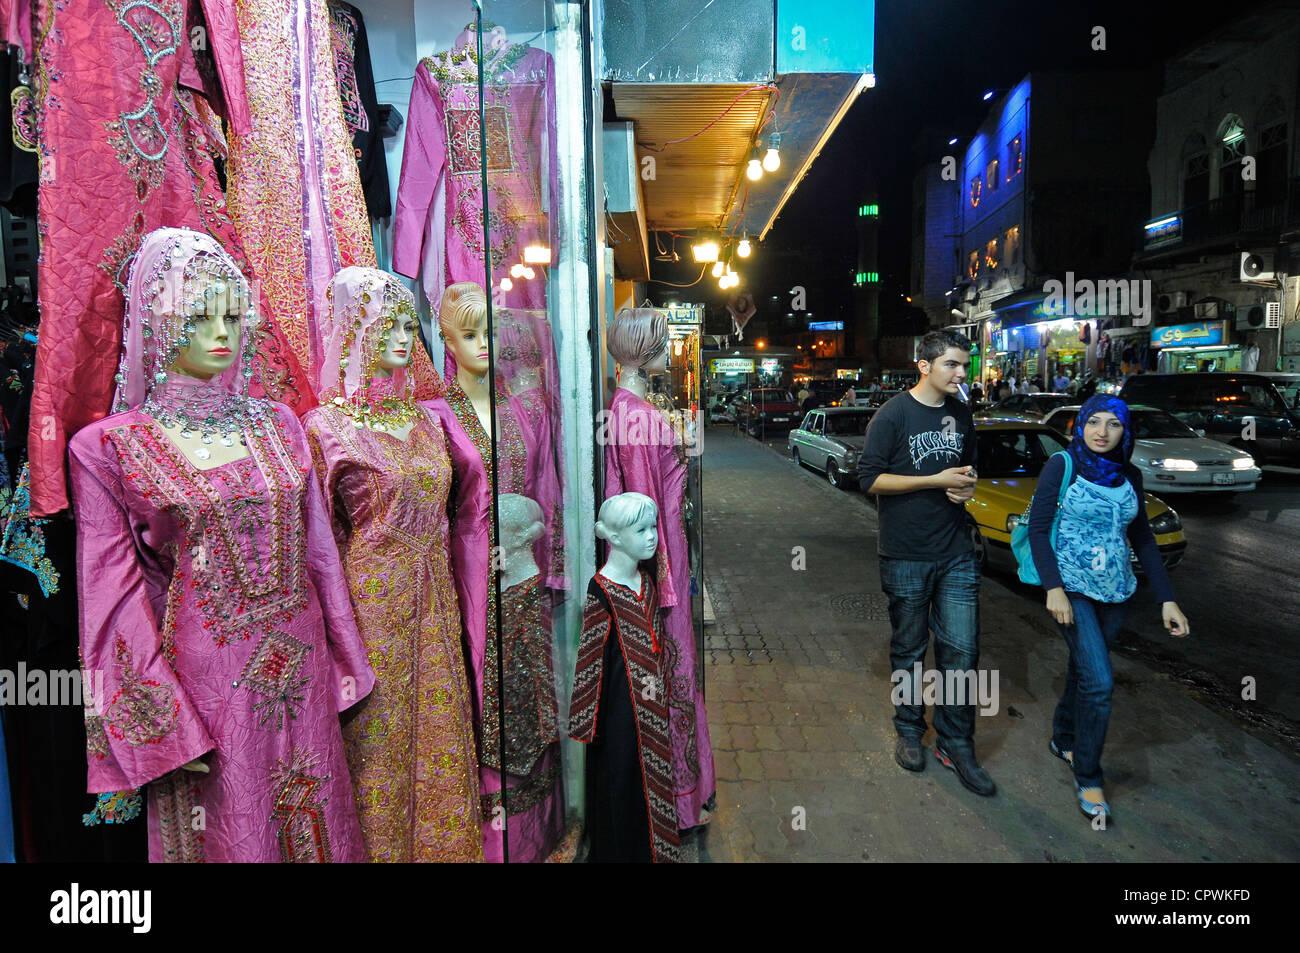 96e7a1e2790d Asia Jordan Amman Traditional clothing store Stock Photo  48507297 ...